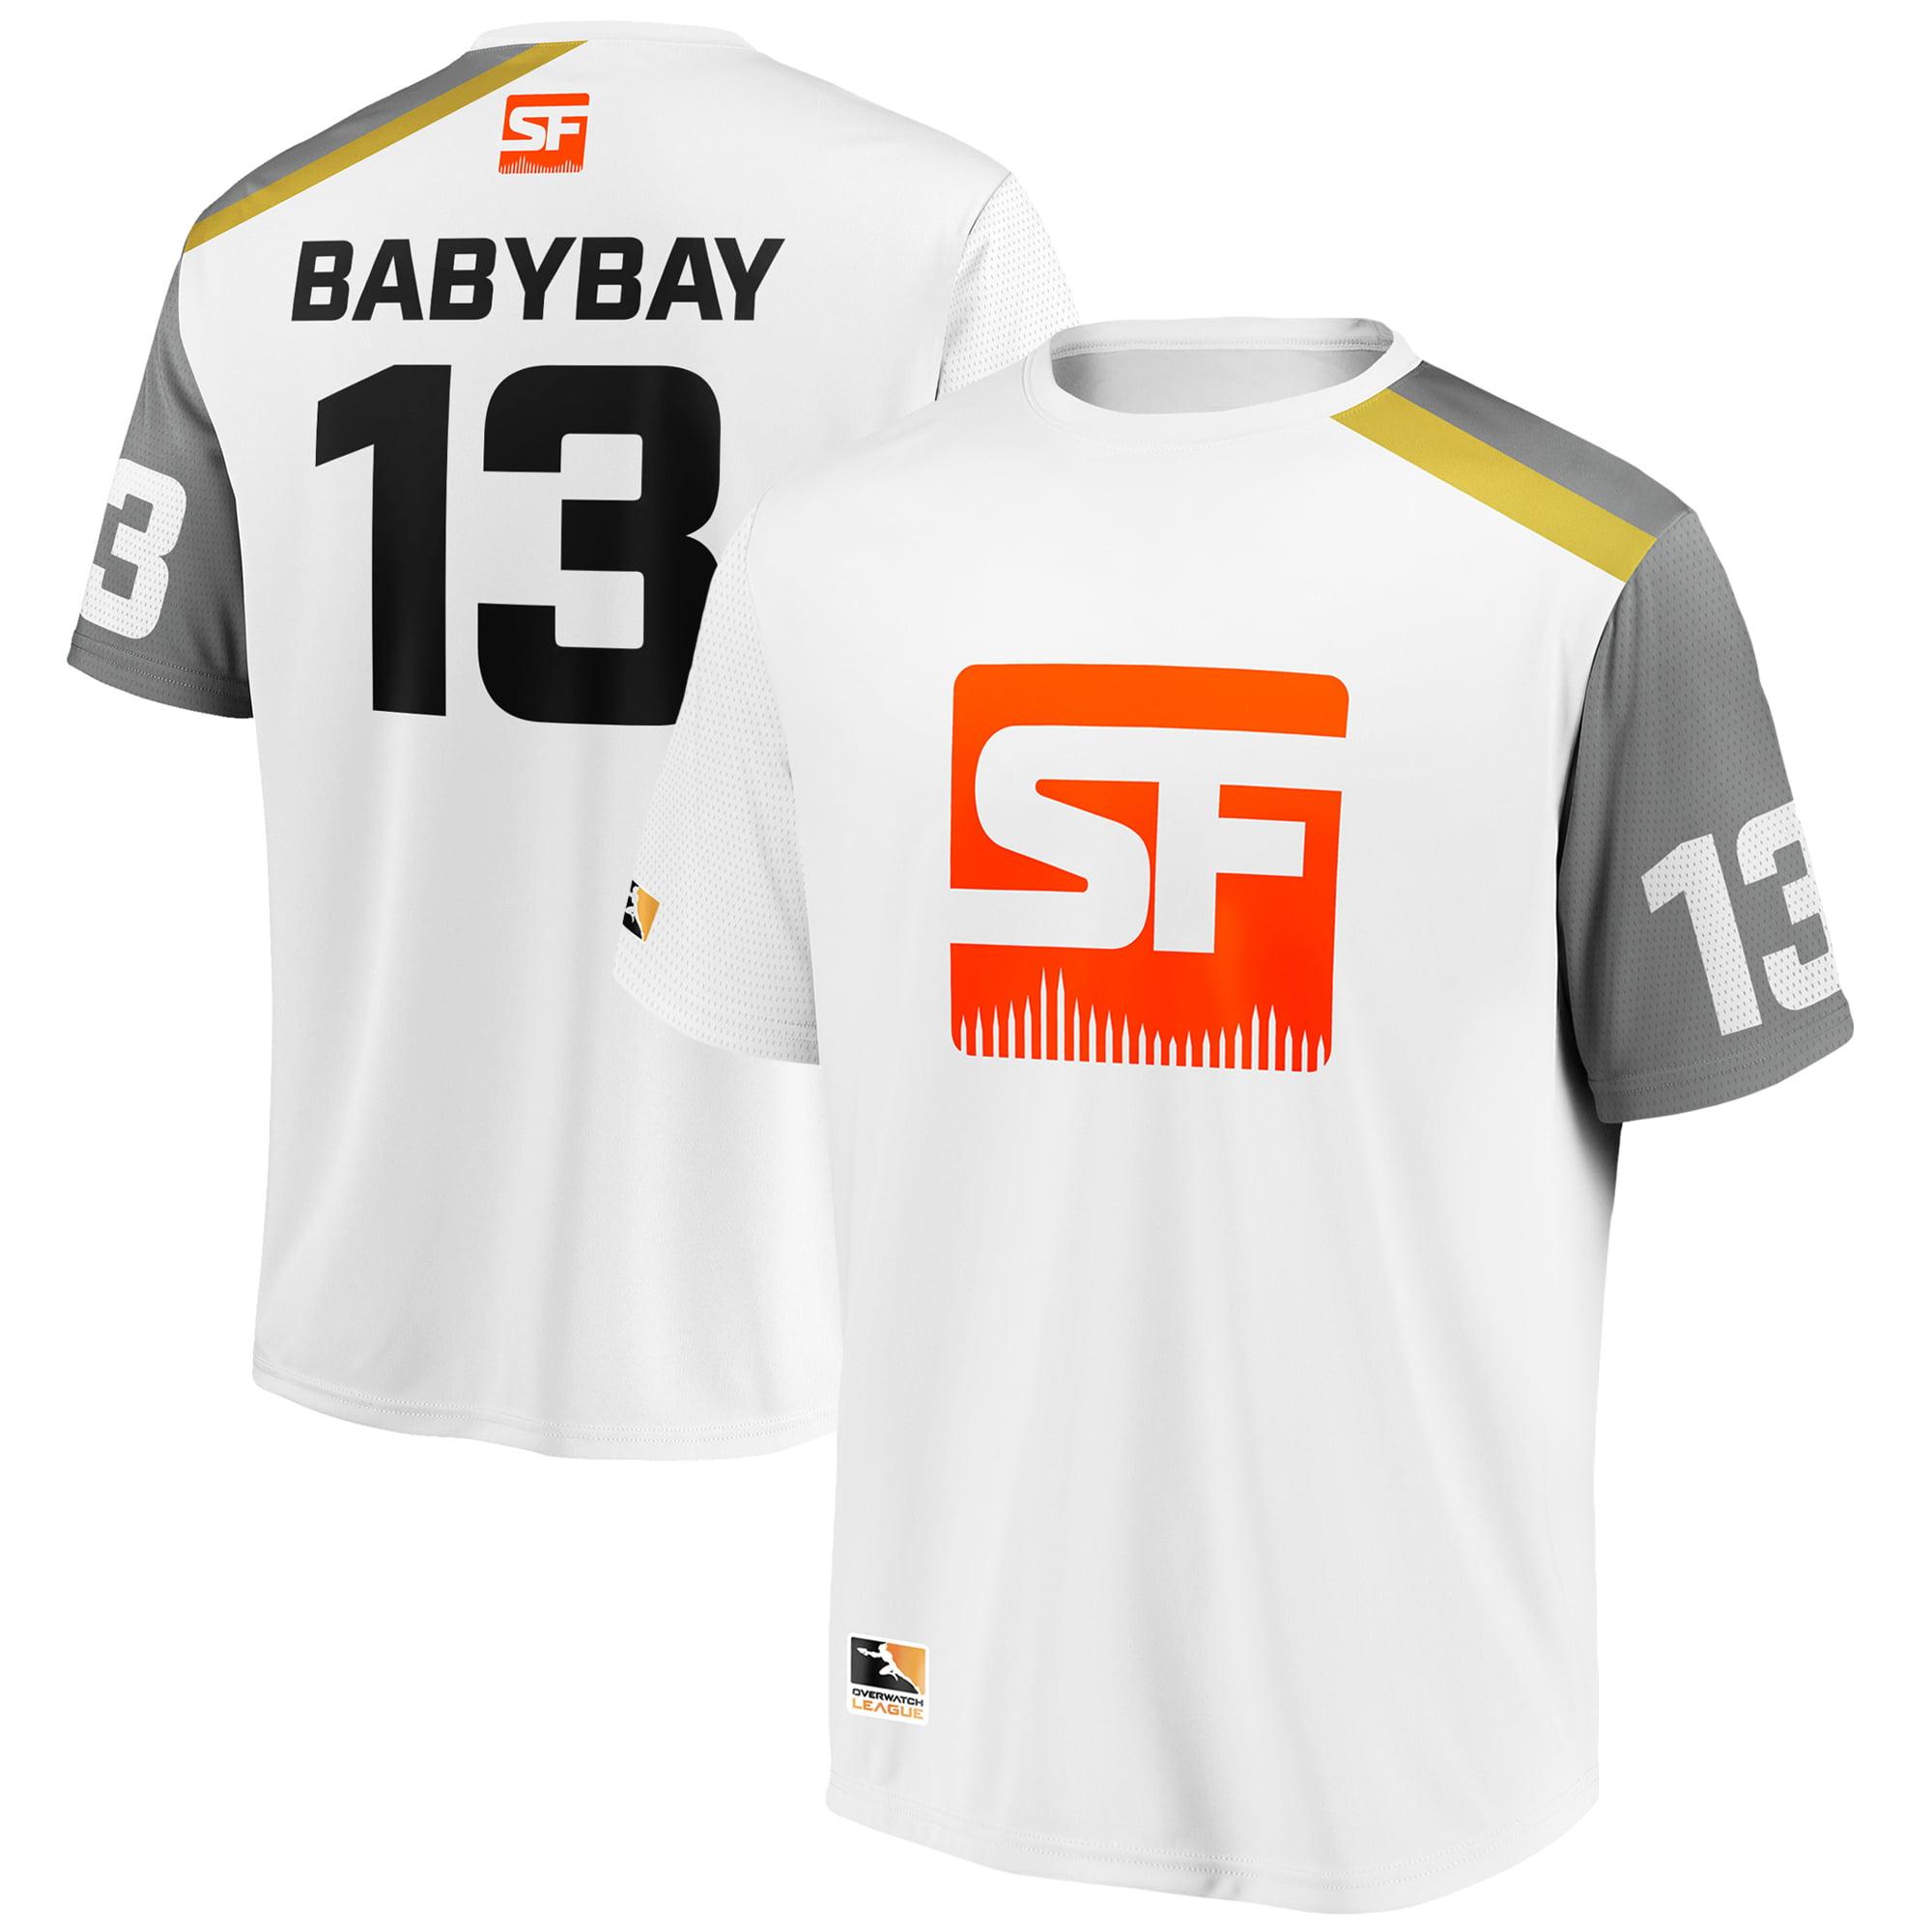 babybay San Francisco Shock Overwatch League Replica Away Jersey - White